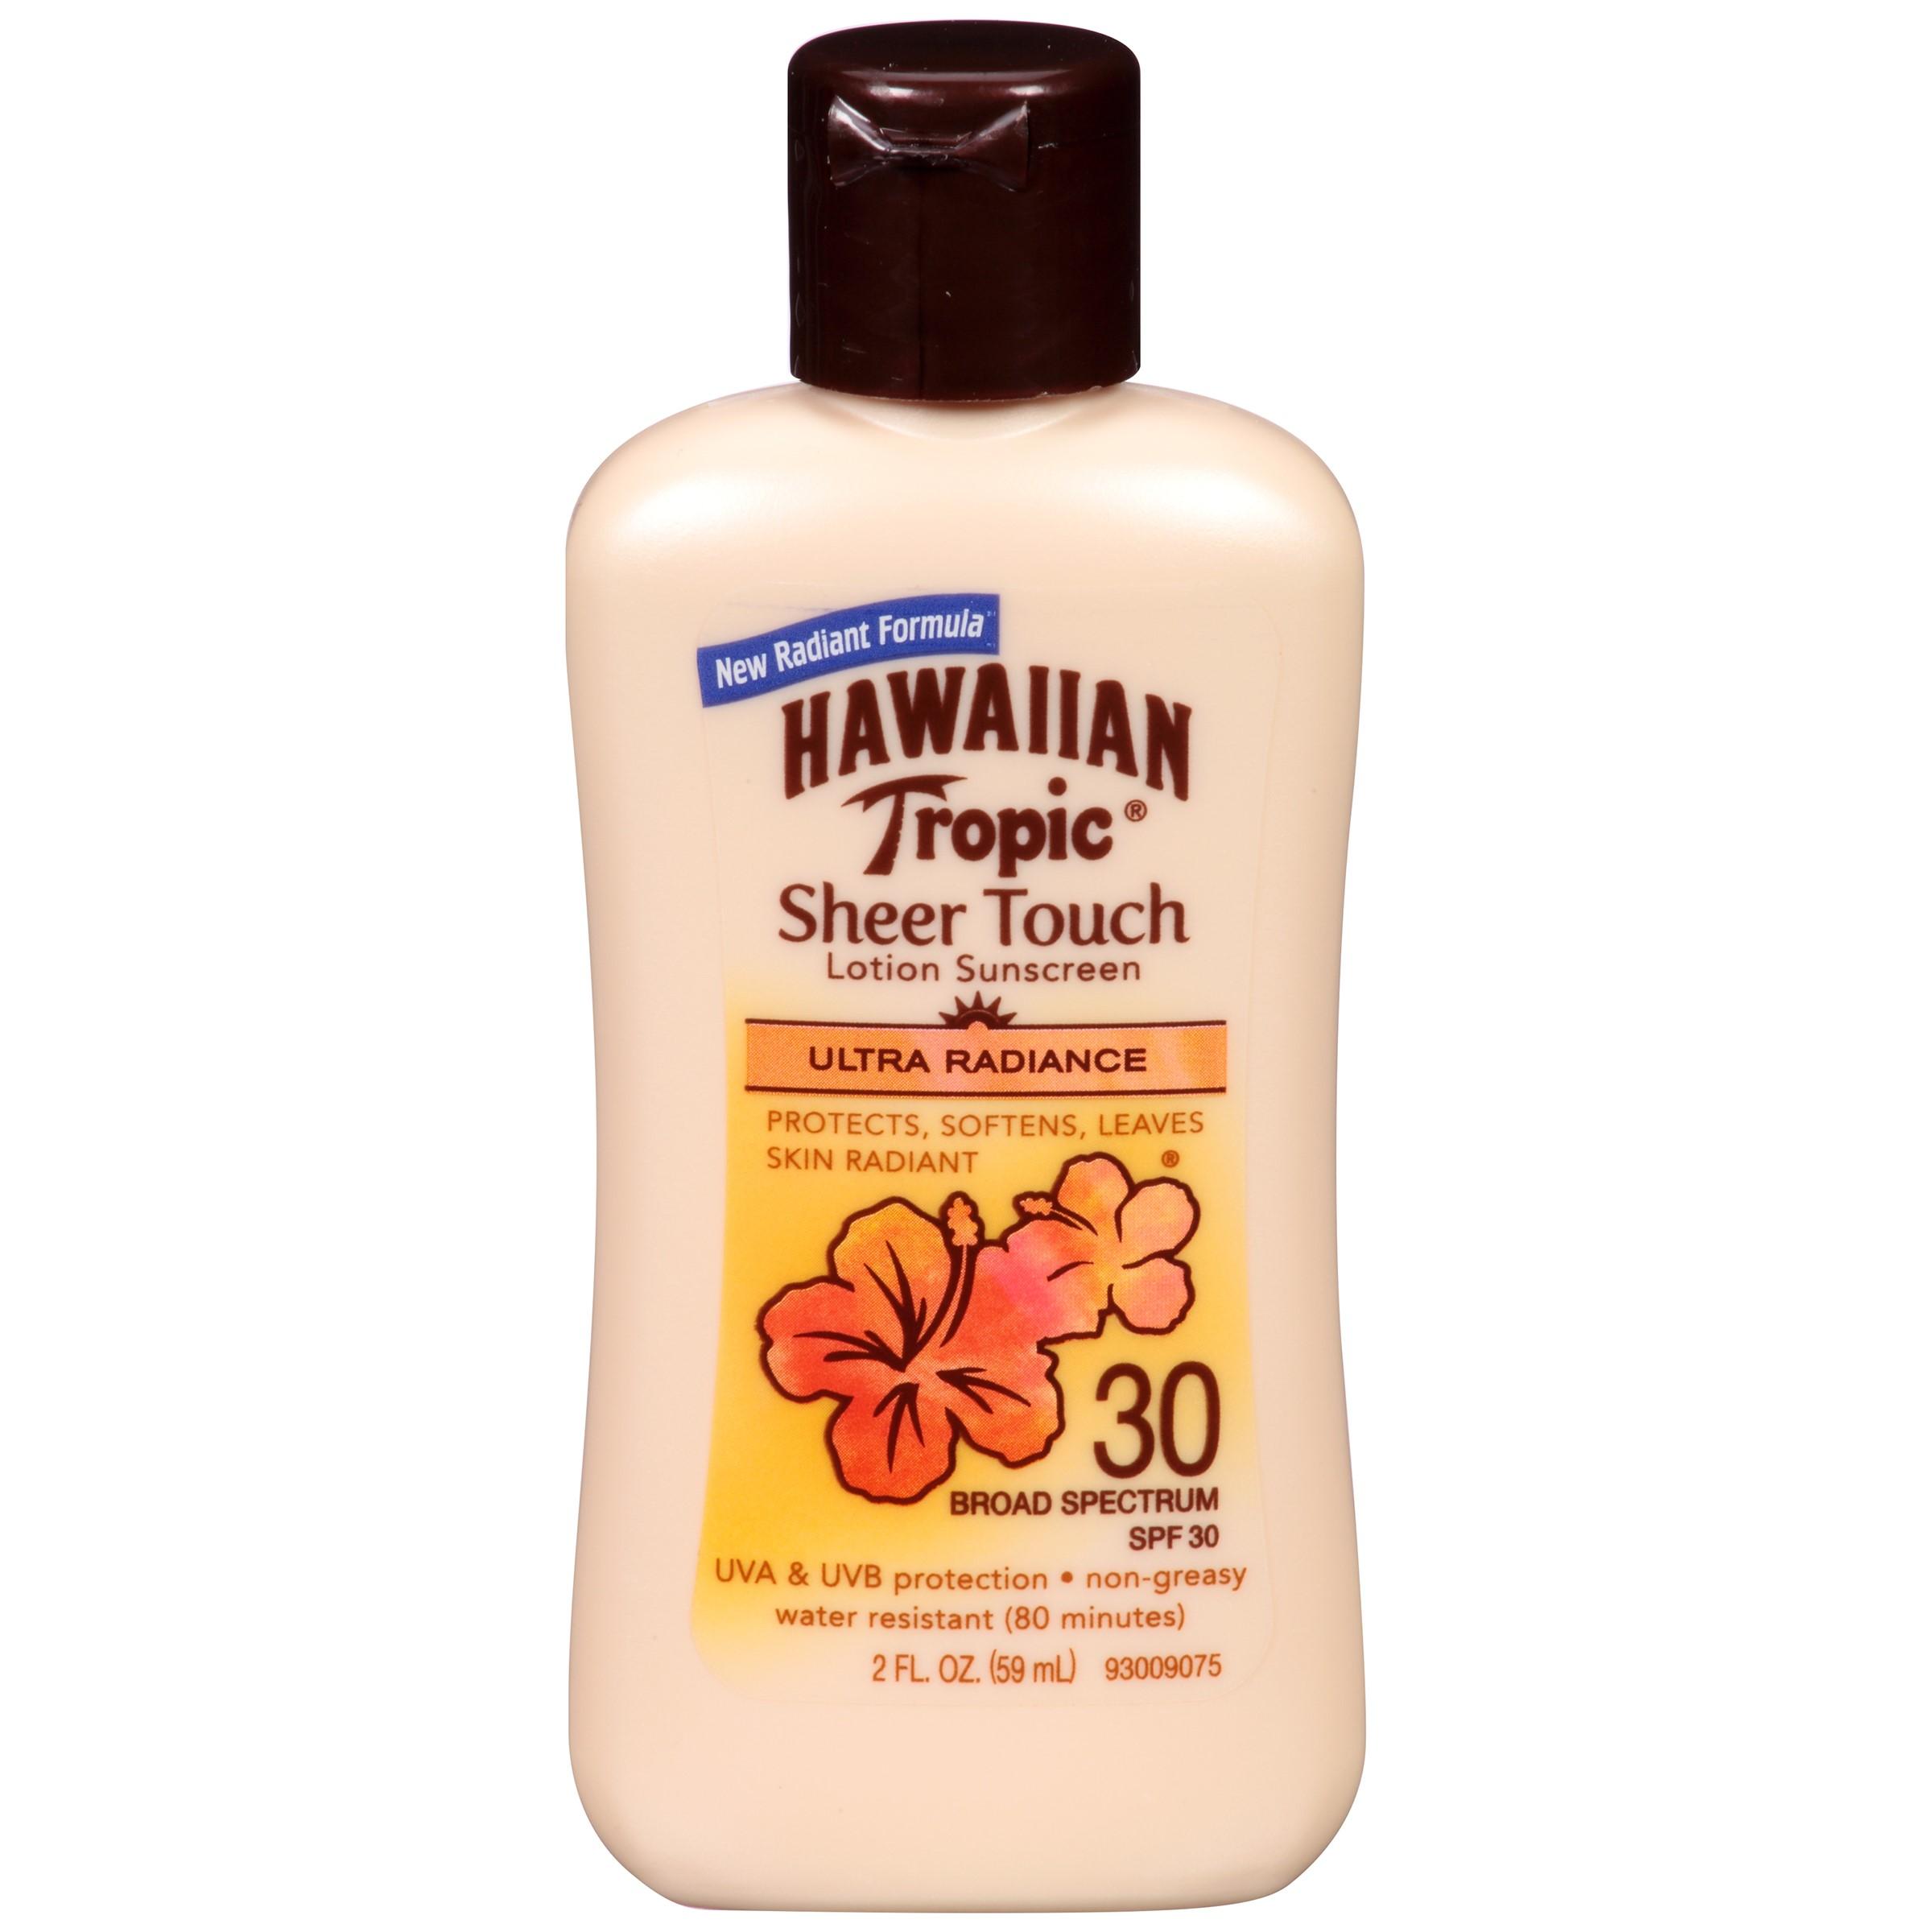 Hawaiian Tropic Sheer Touch Ultra Radiance Travel Size